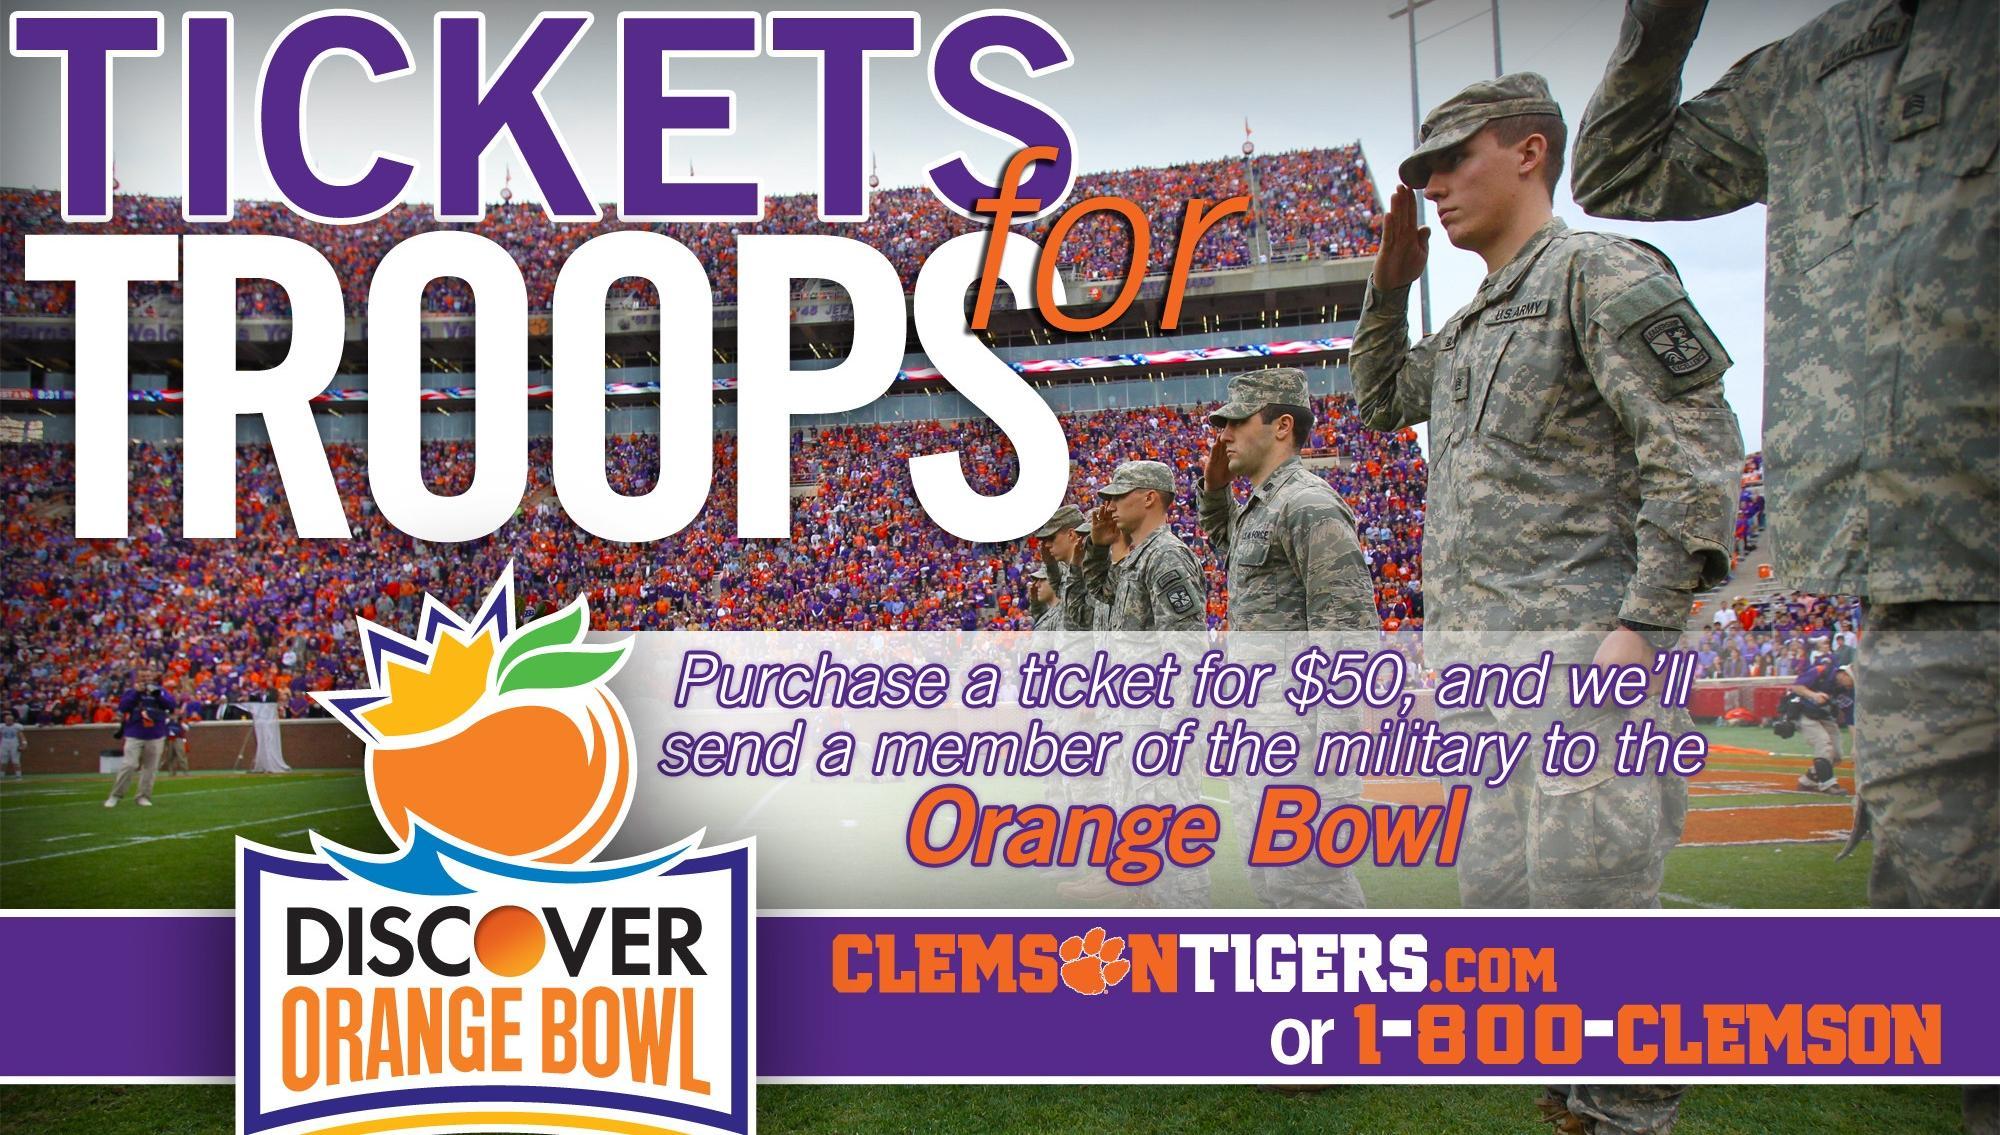 Clemson Announces Tickets for Troops Program